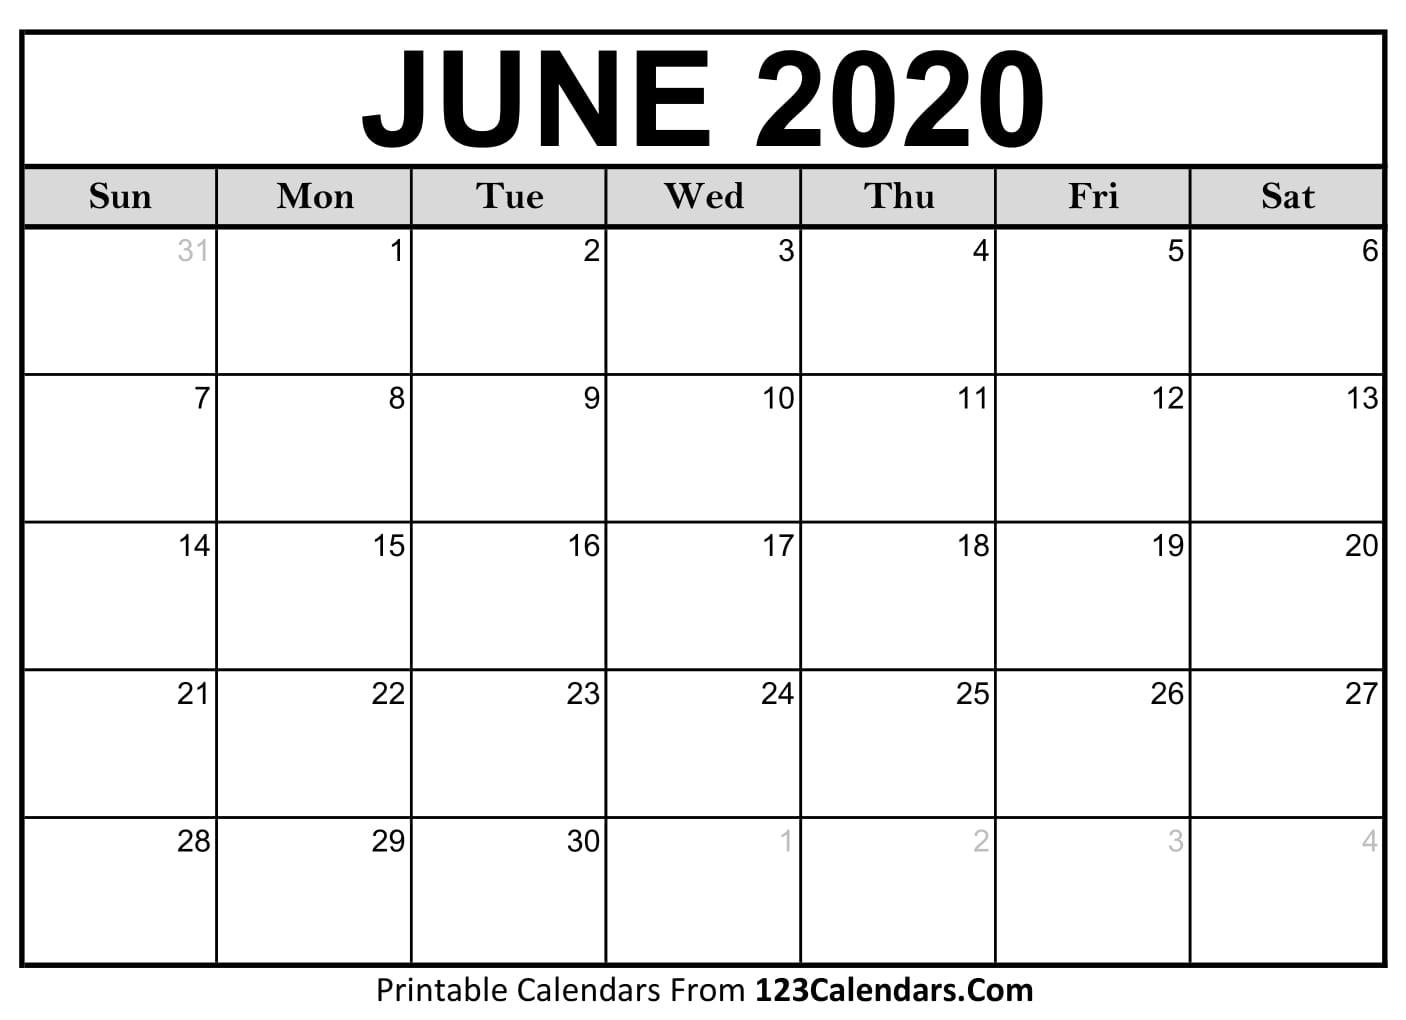 June 2020 Printable Calendar   123Calendars